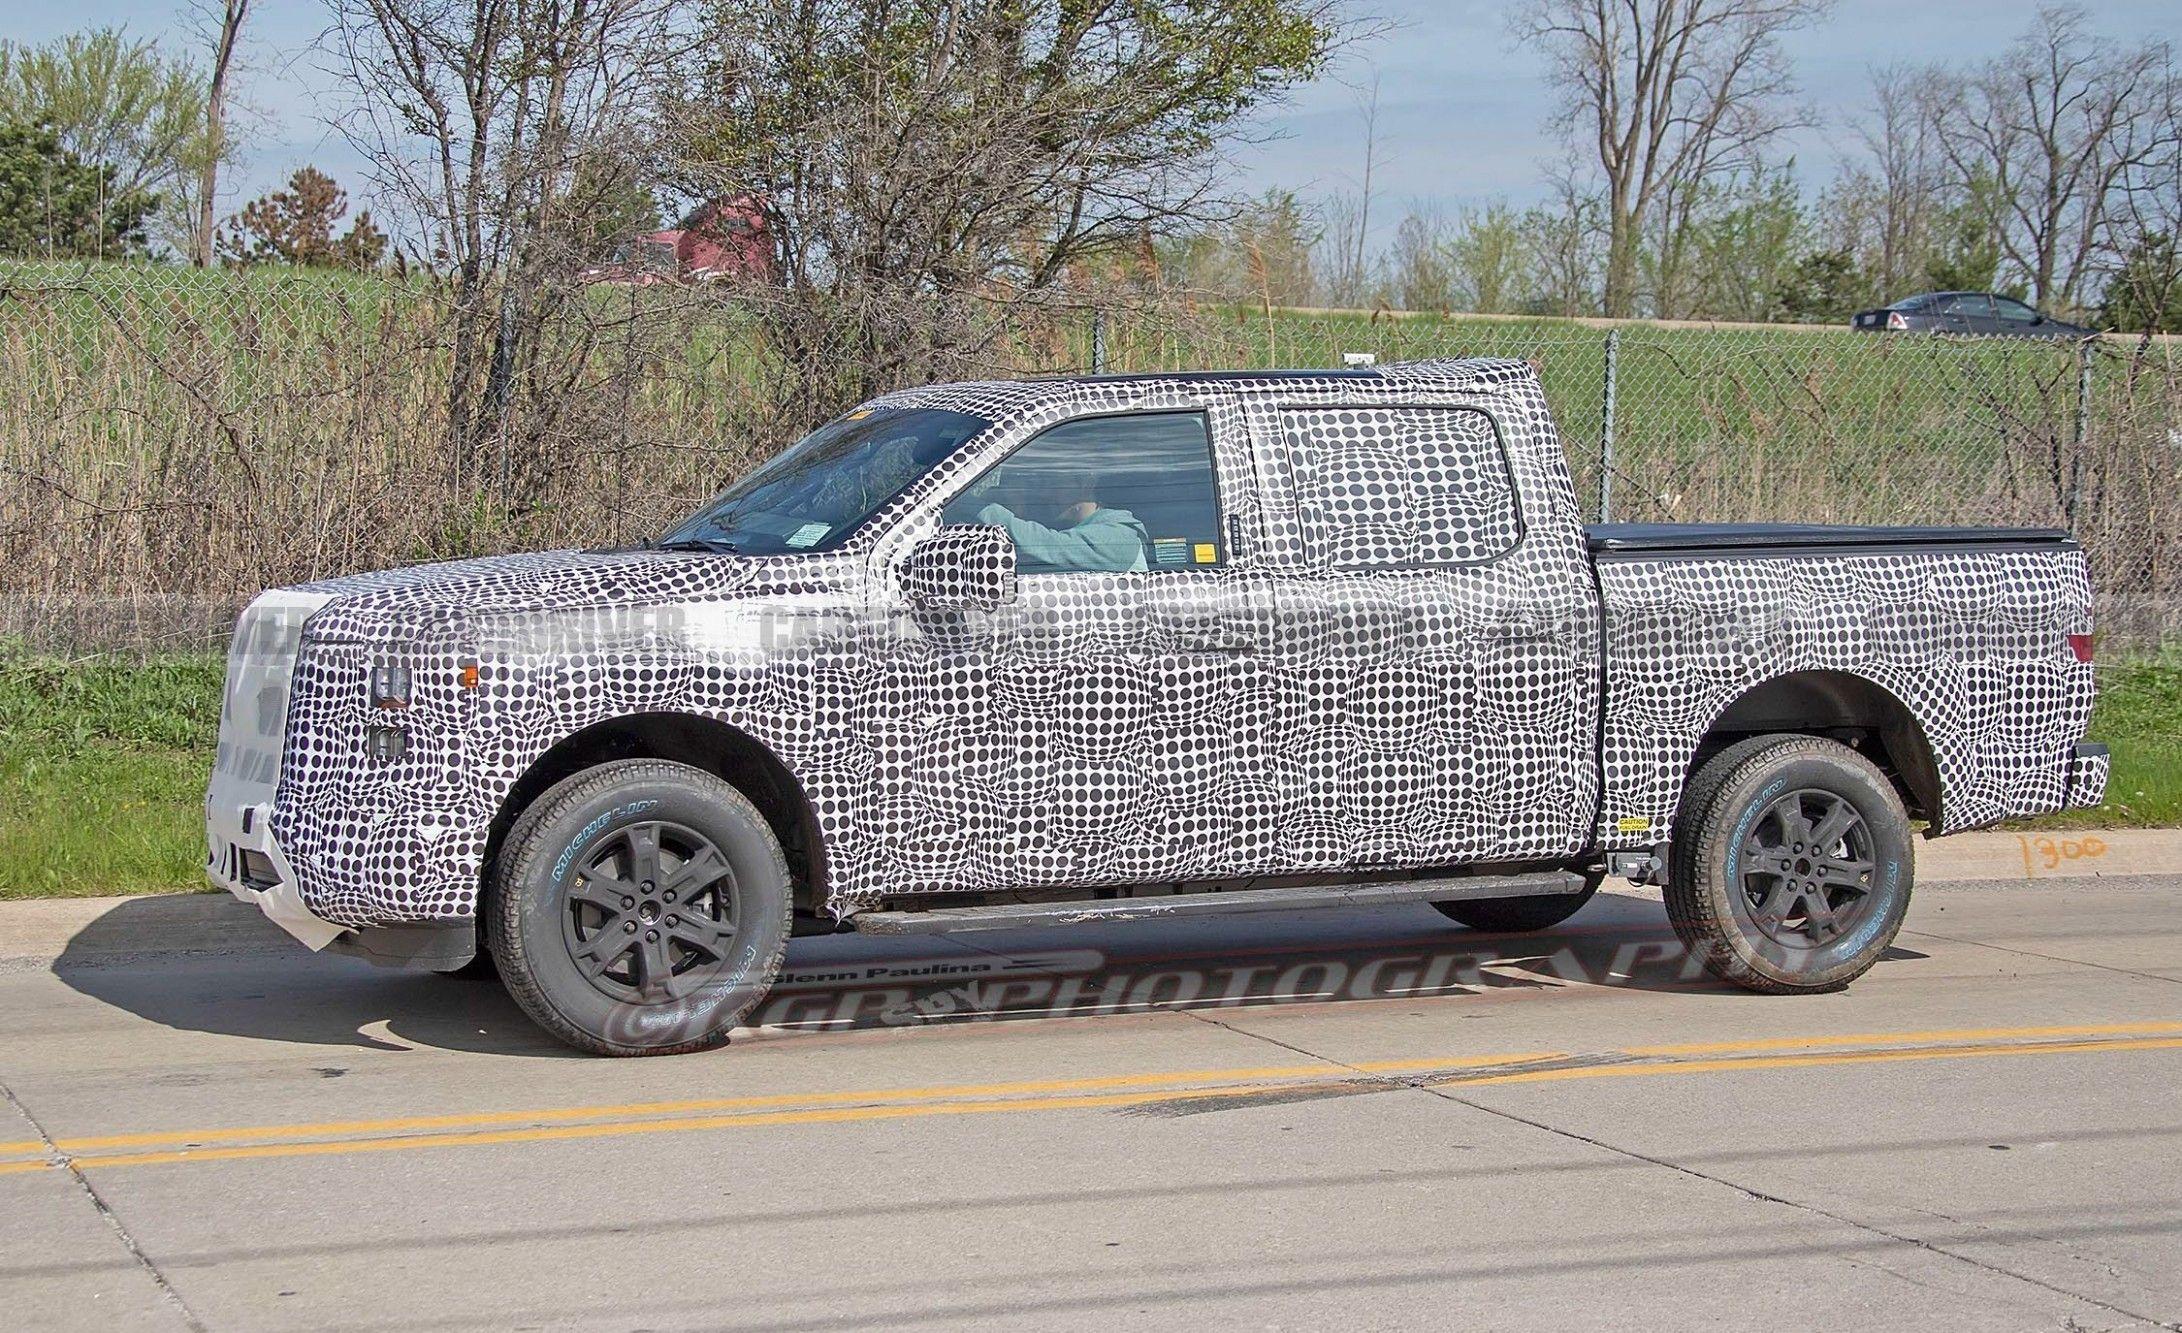 2021 Ford Lightning Svt Pricing